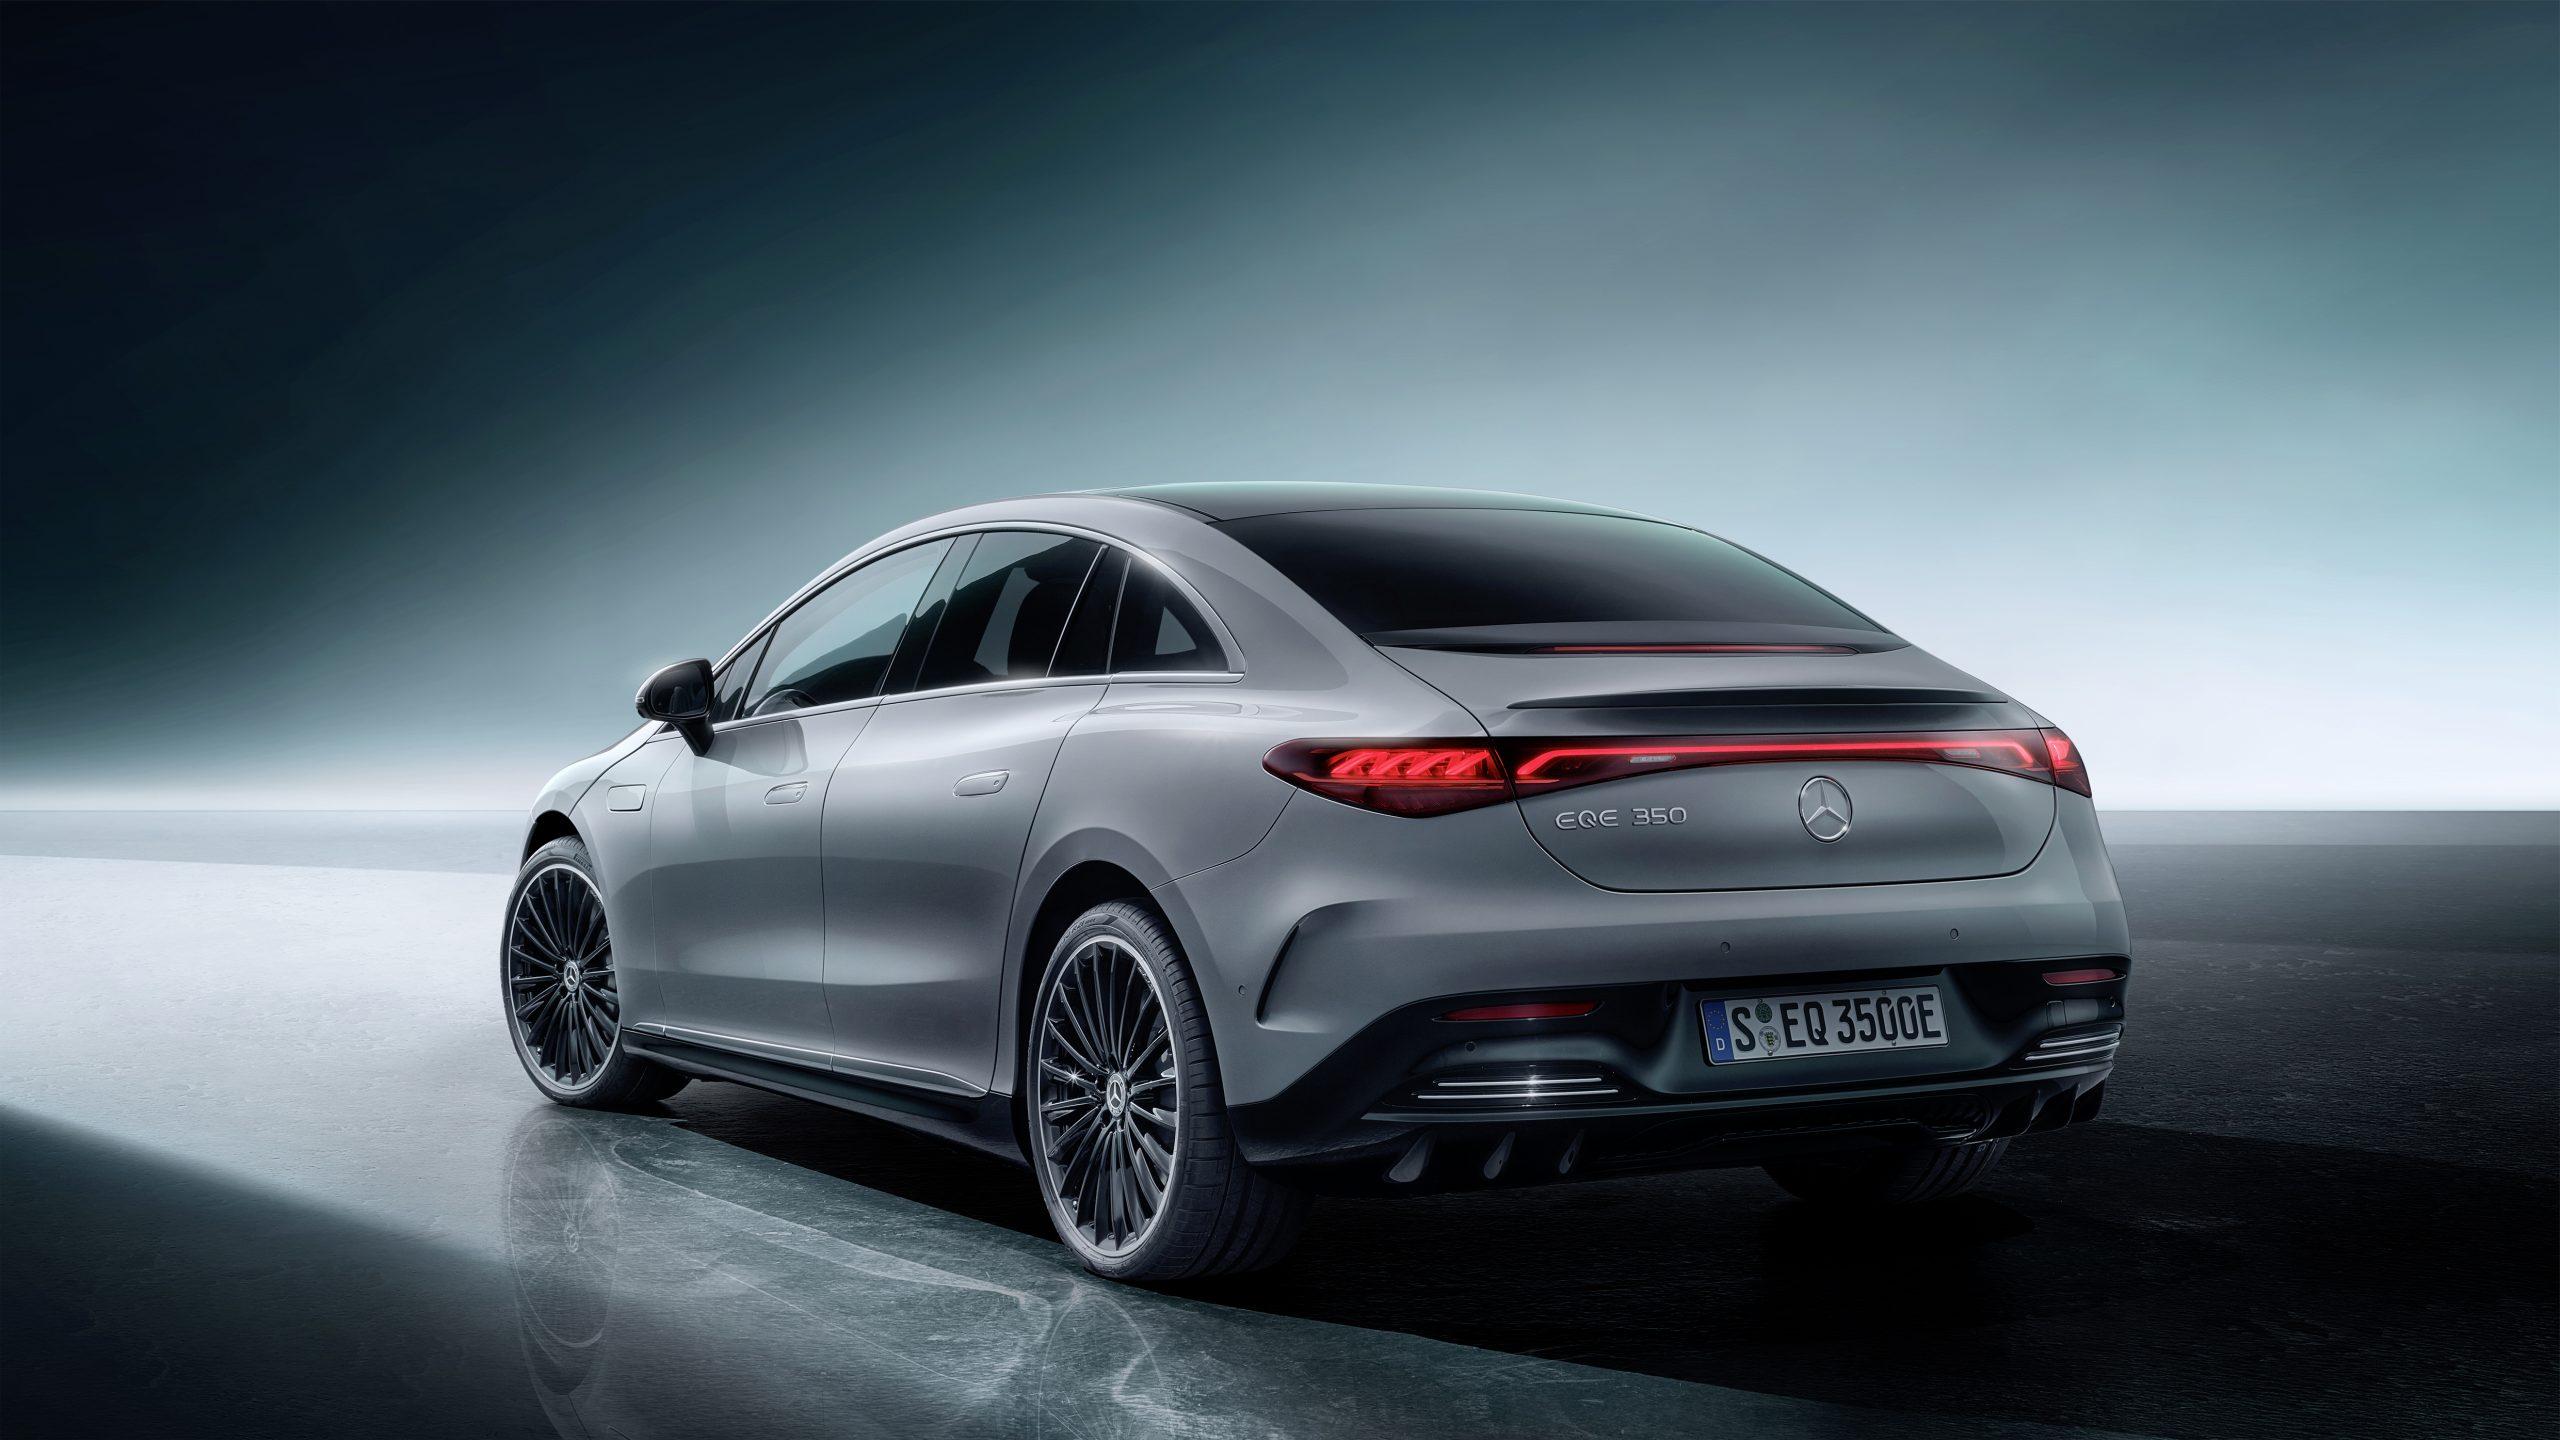 Mercedes-EQ. EQE 350, Edition 1, AMG Line